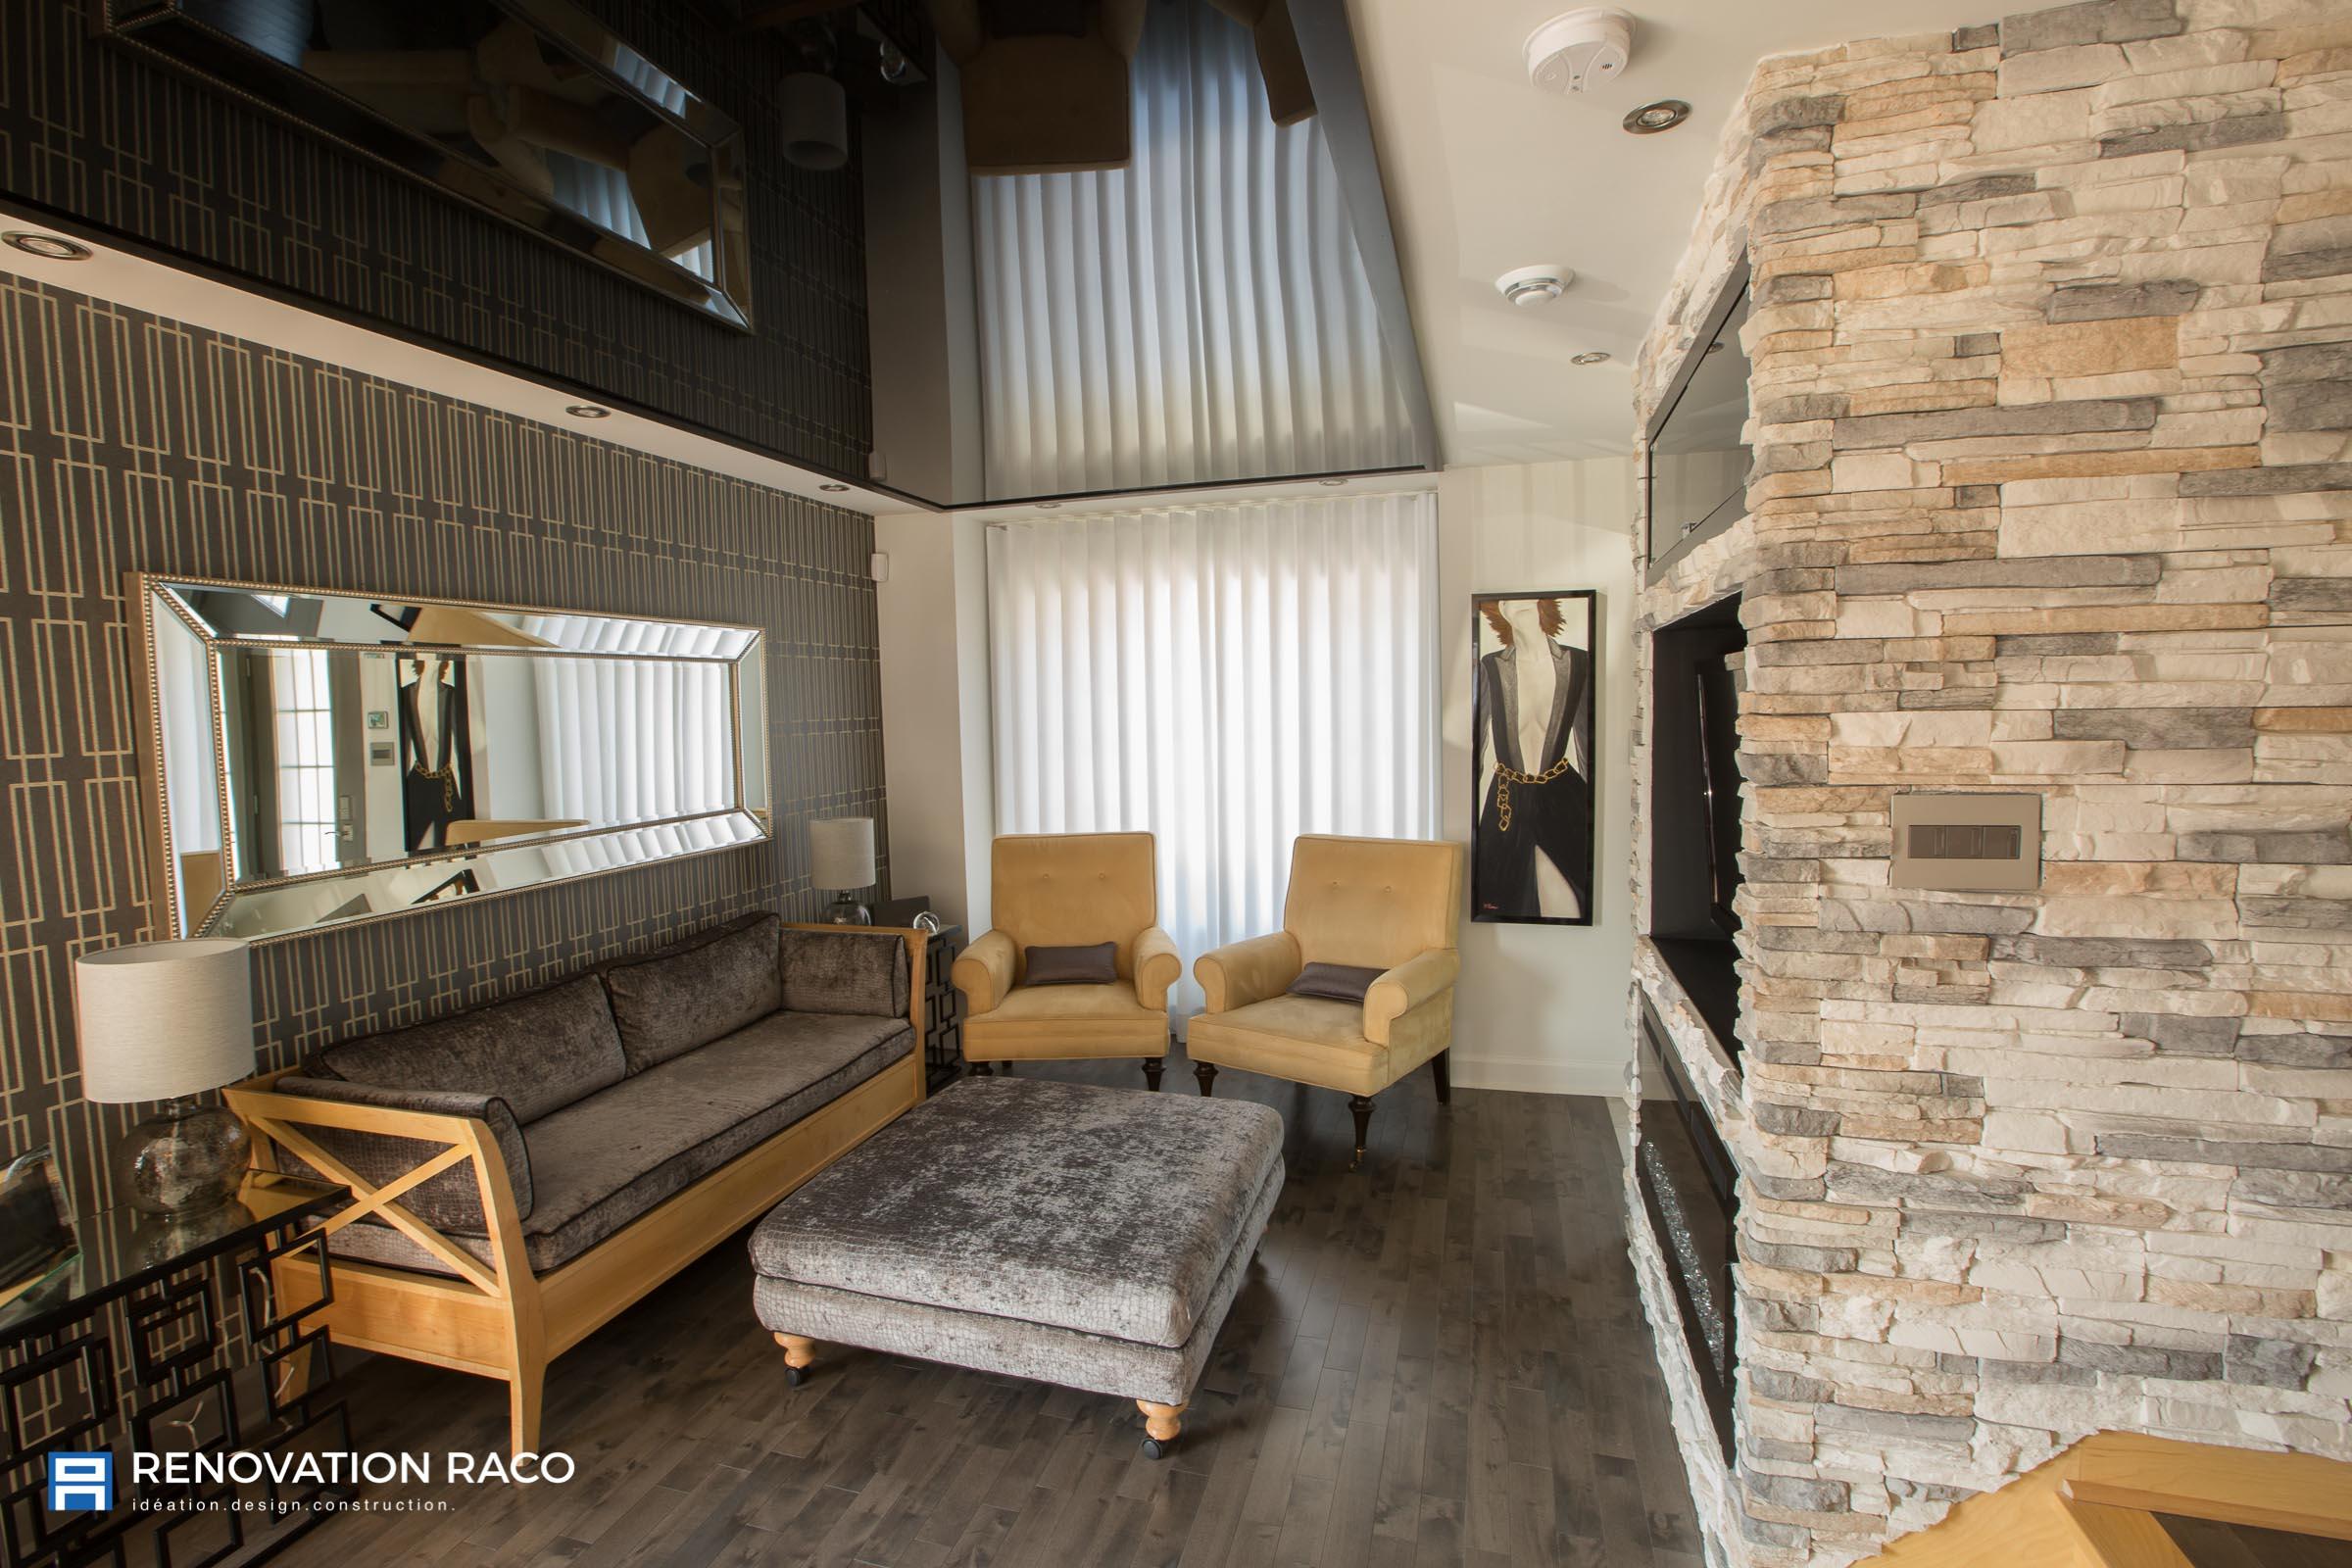 Renovation-desing-interieur-montreal-03.jpg